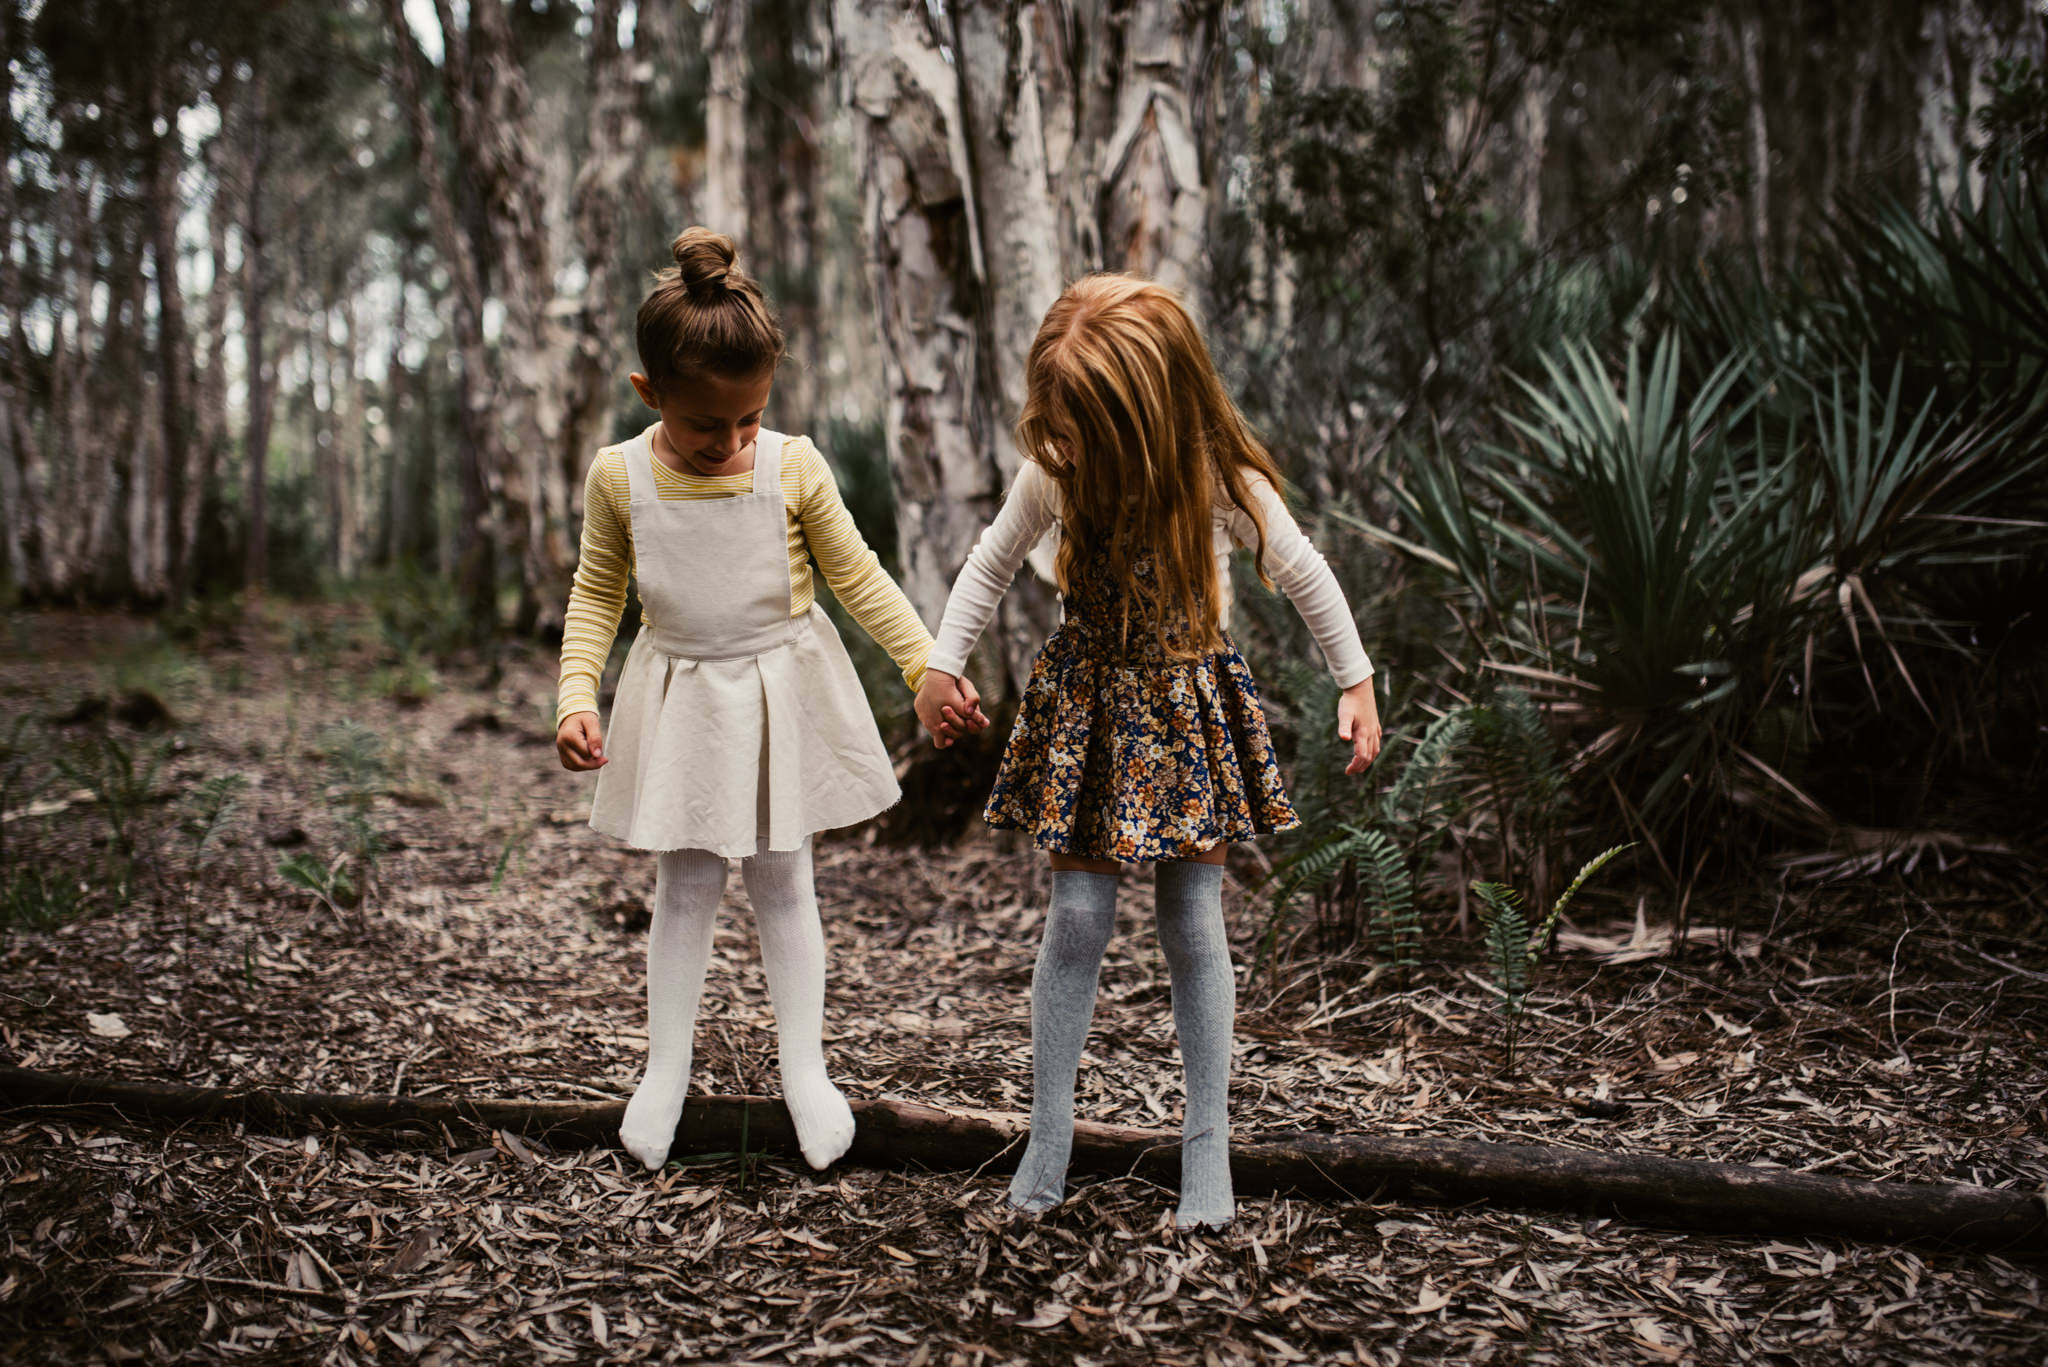 twyla jones photography - treasure coast florida - childrens adventure clothing commercial shoot--5.jpg